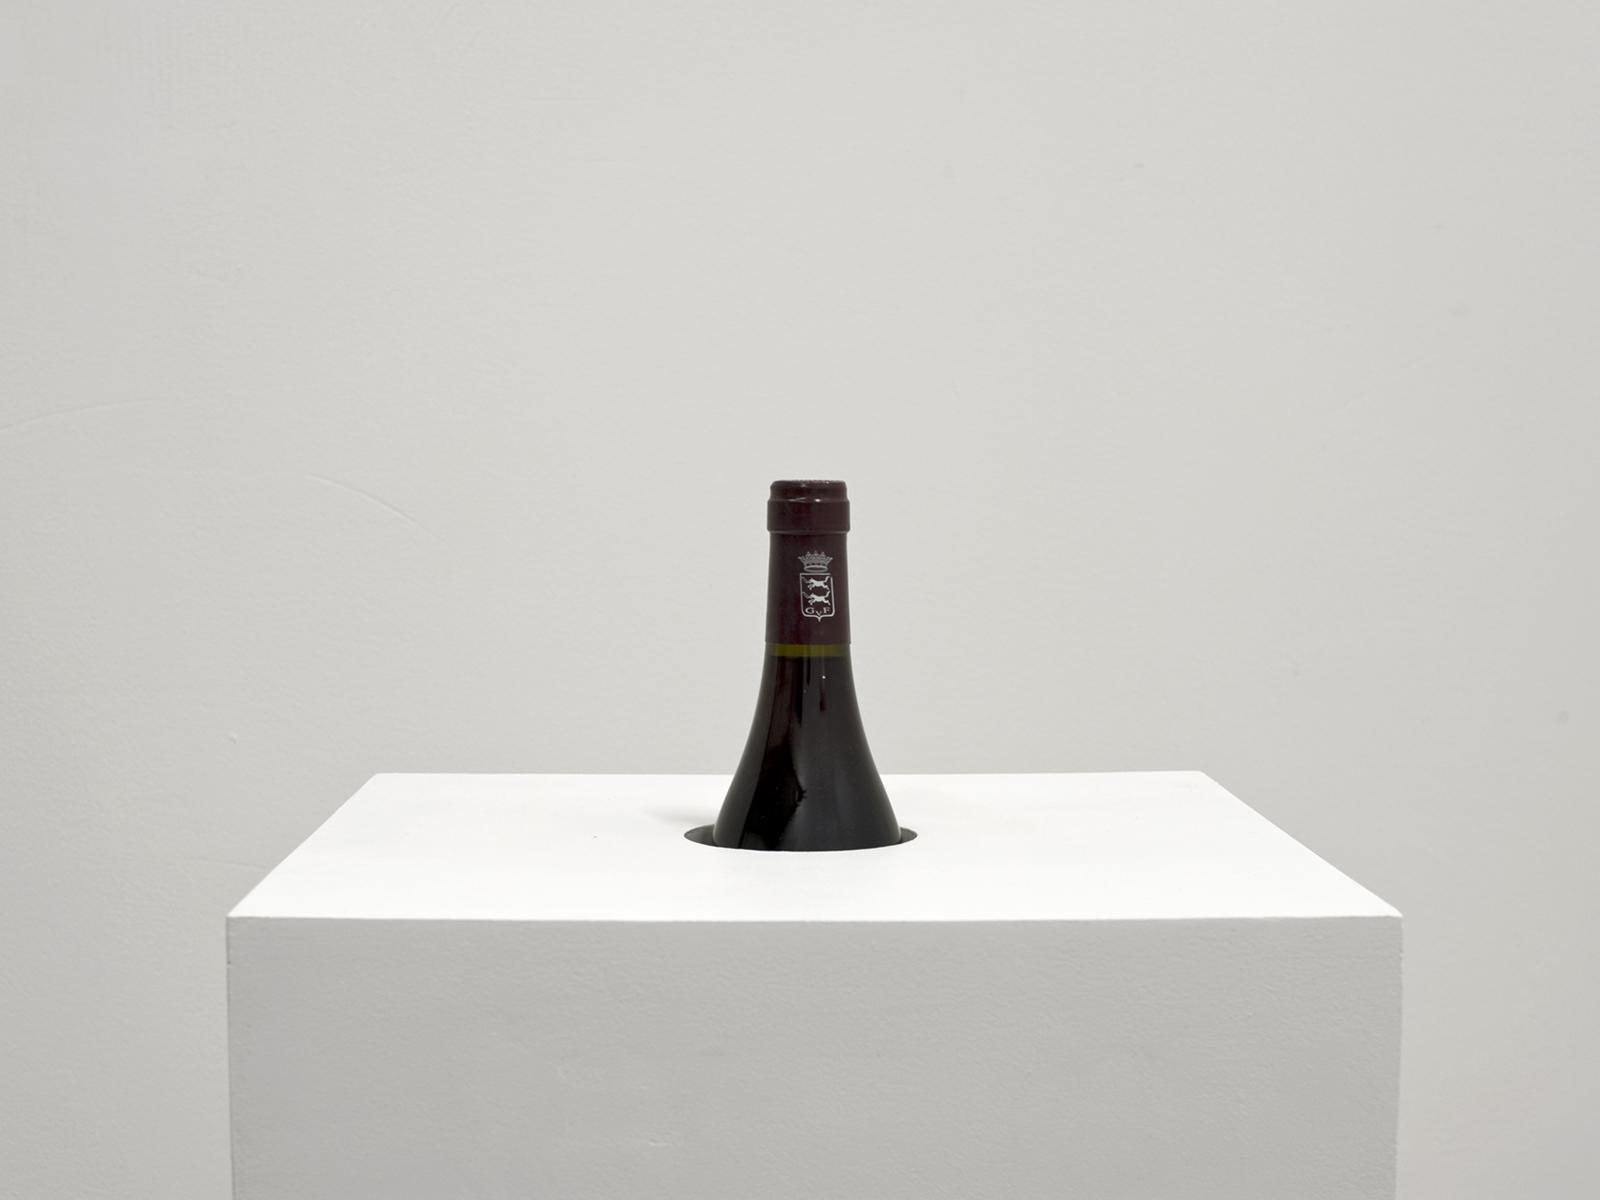 Benoit-Delaunay-artiste-sculptures-2011-Premier Cru-04